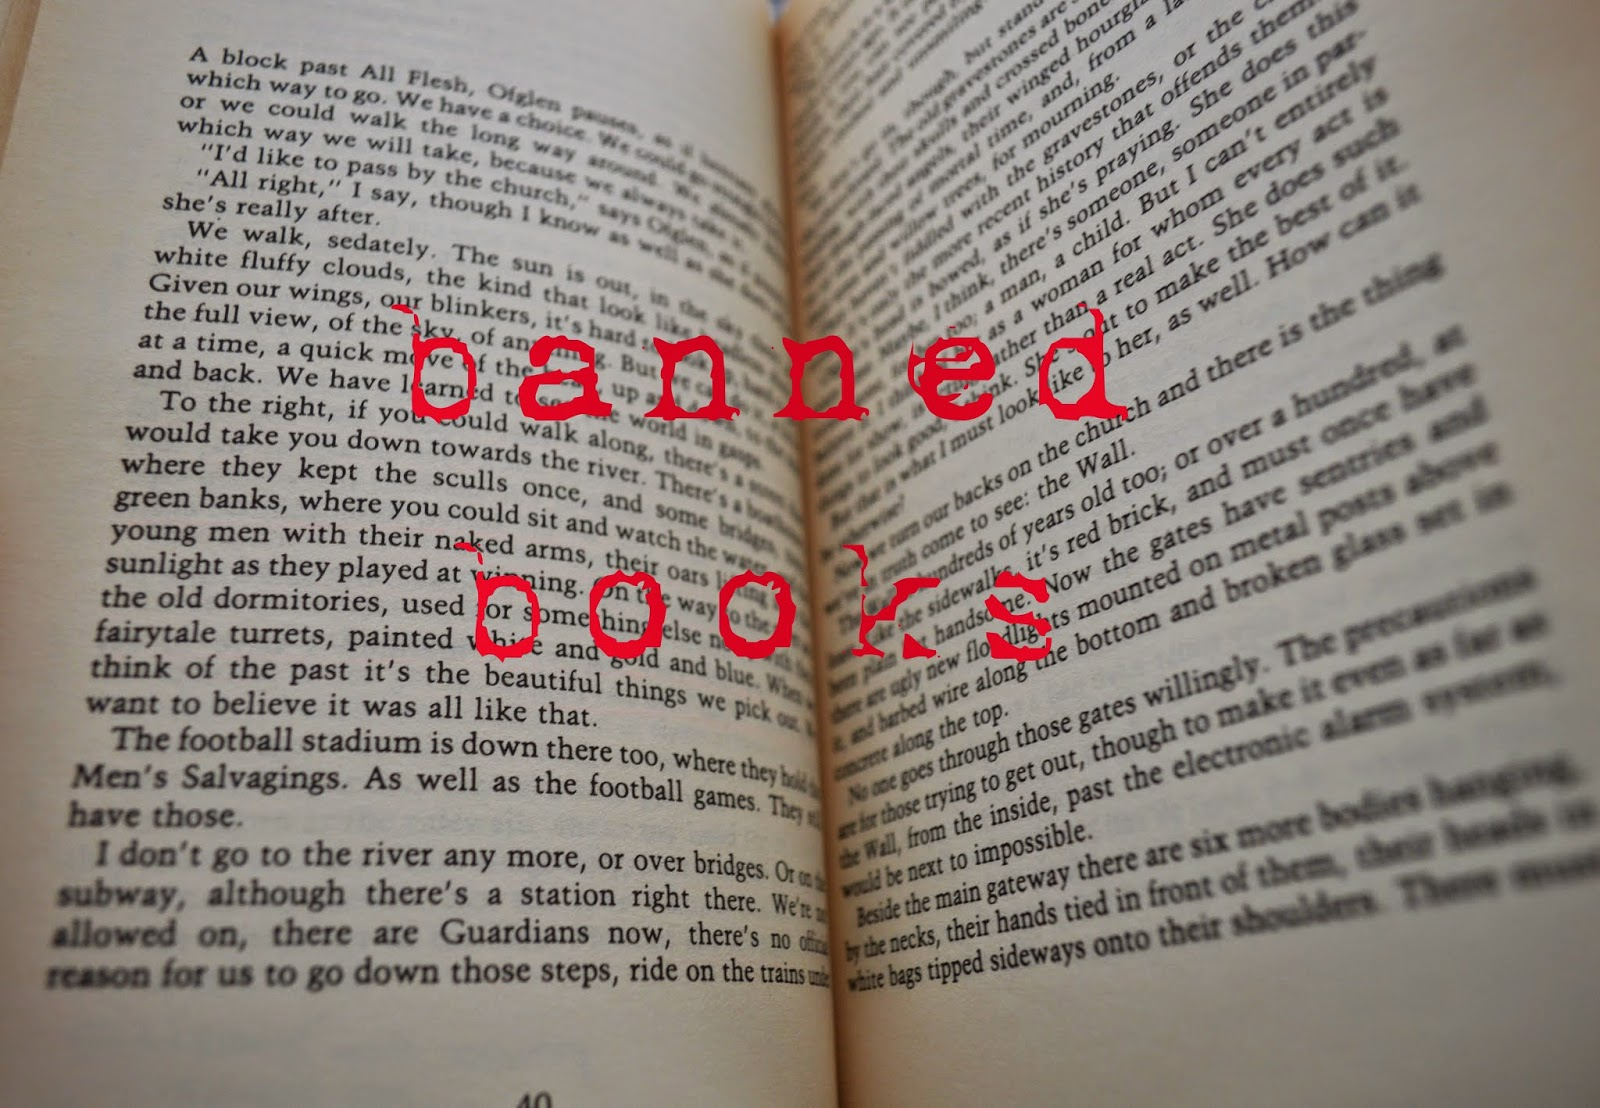 I read banned books, list, censorship, UK banned books, USSR, record, US, reason, literature, photo, photograph